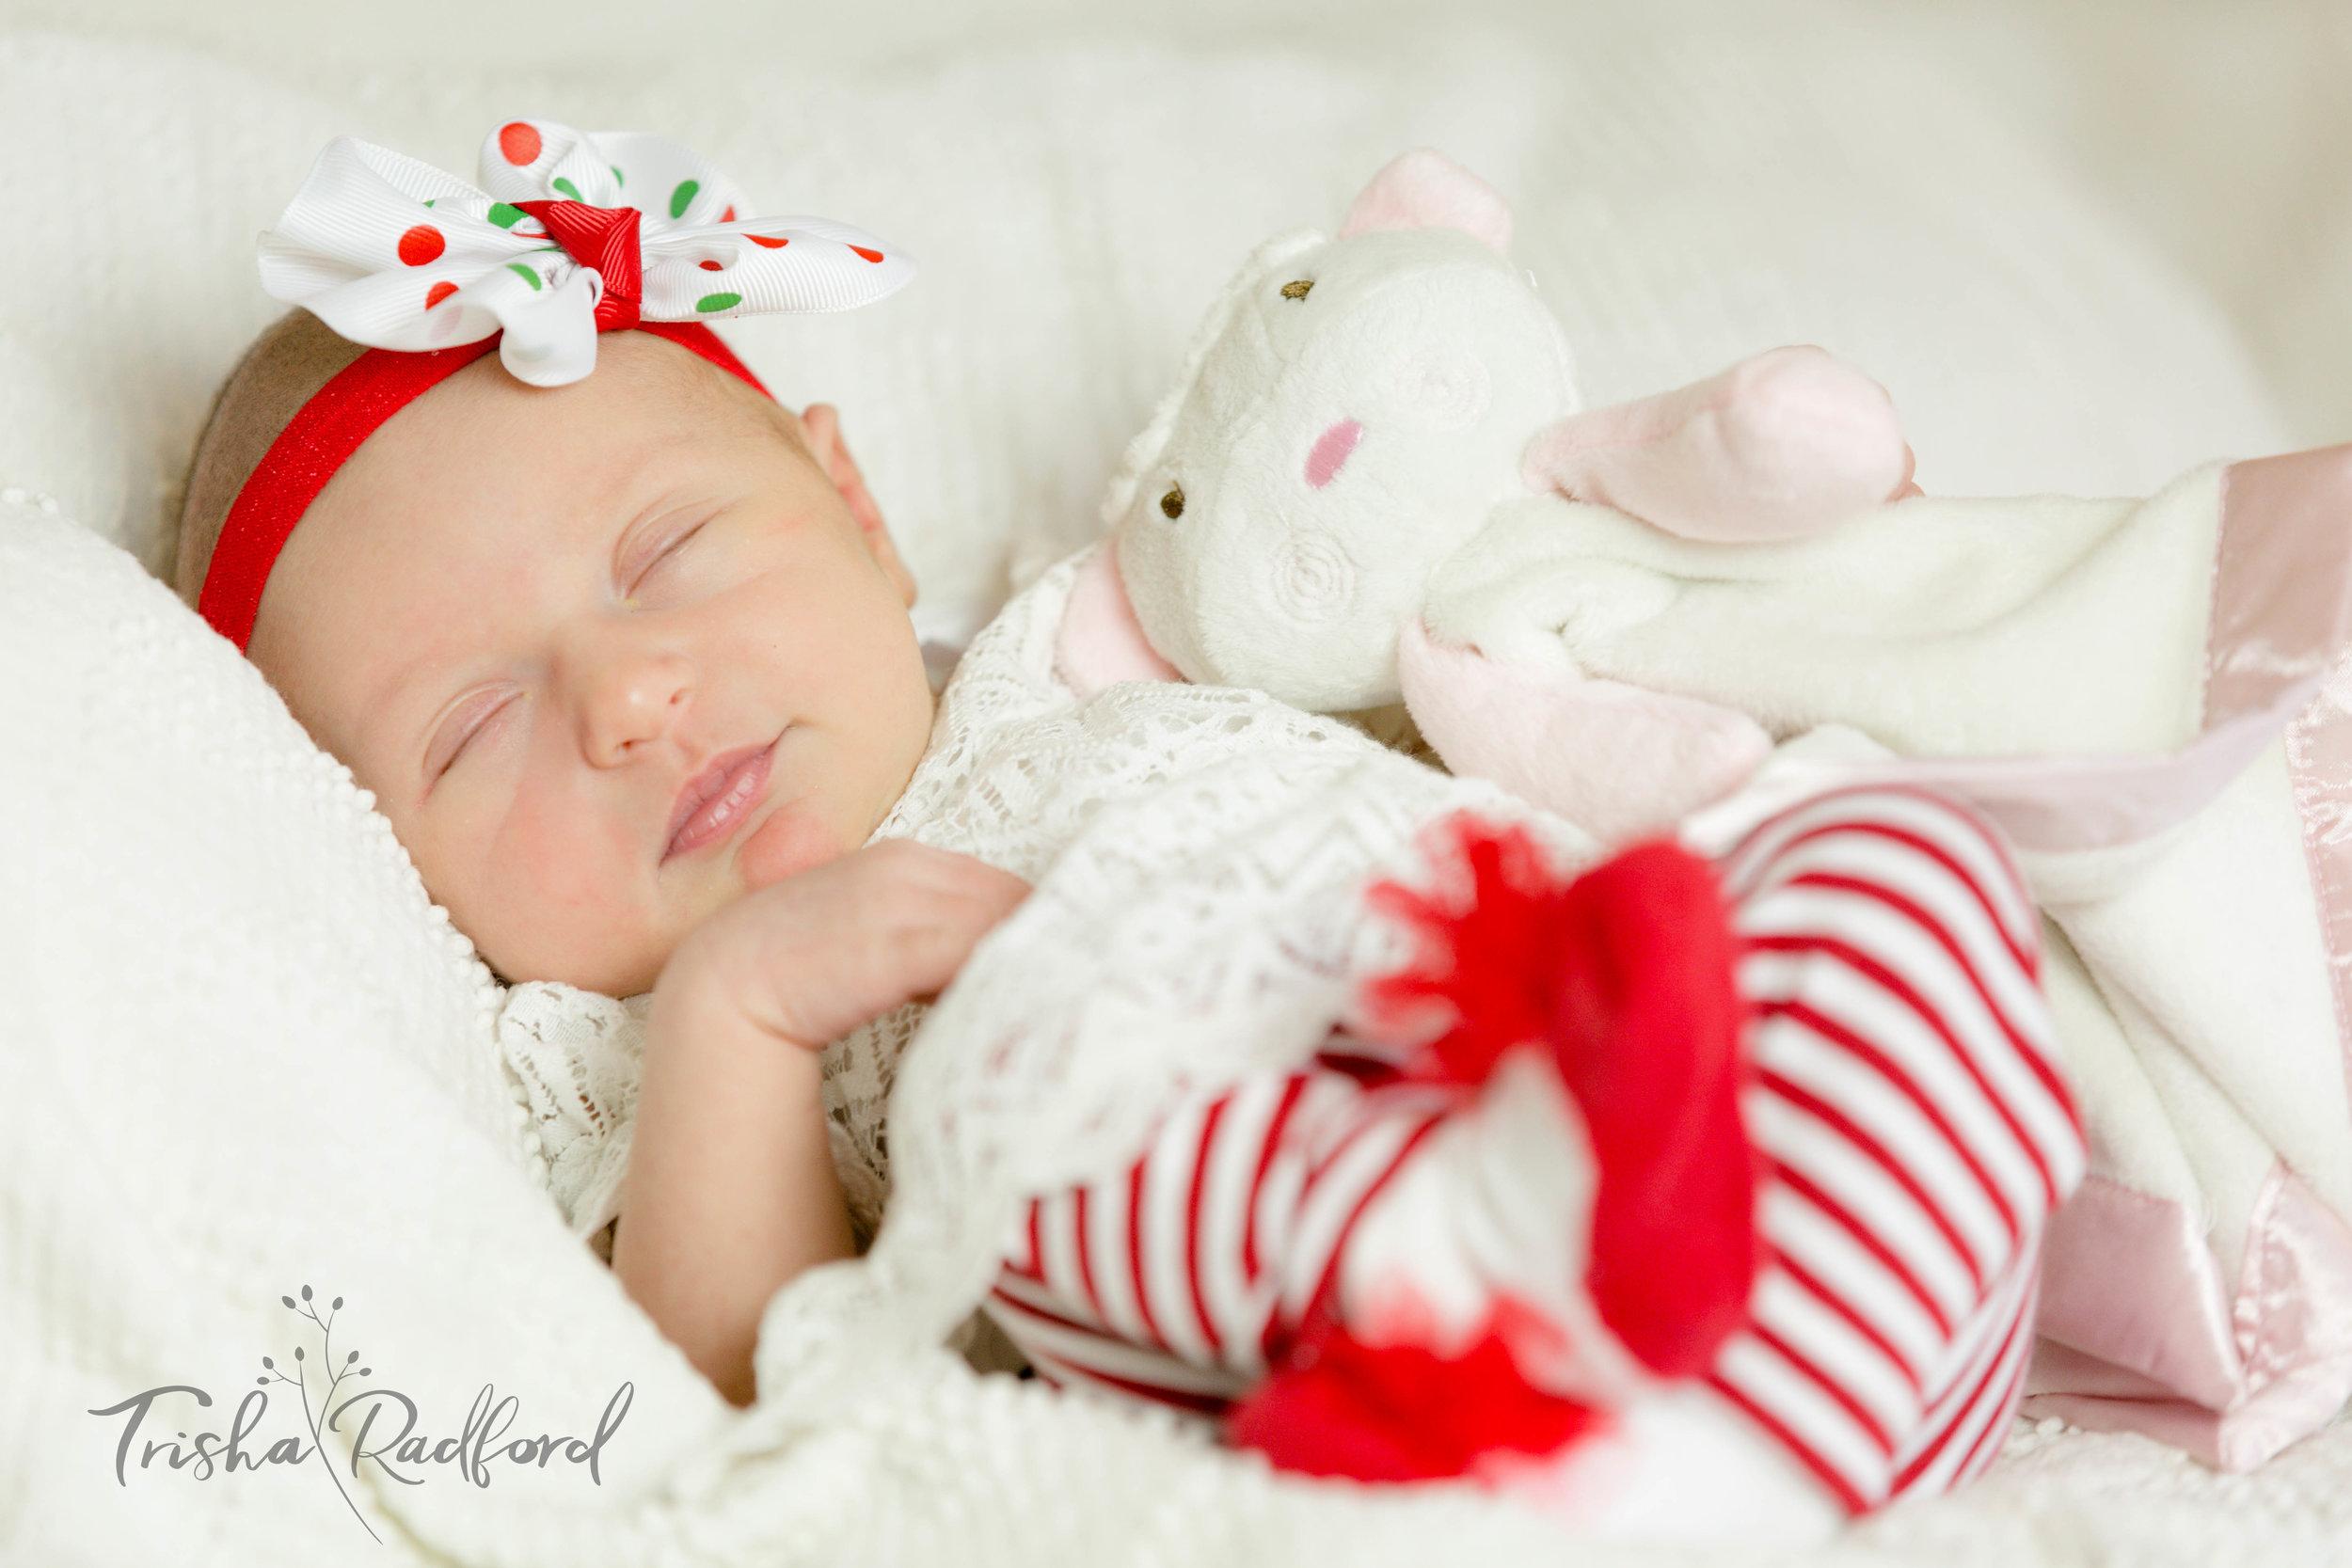 Lifestyle Newborn & Family Photography | Snohomish, WA